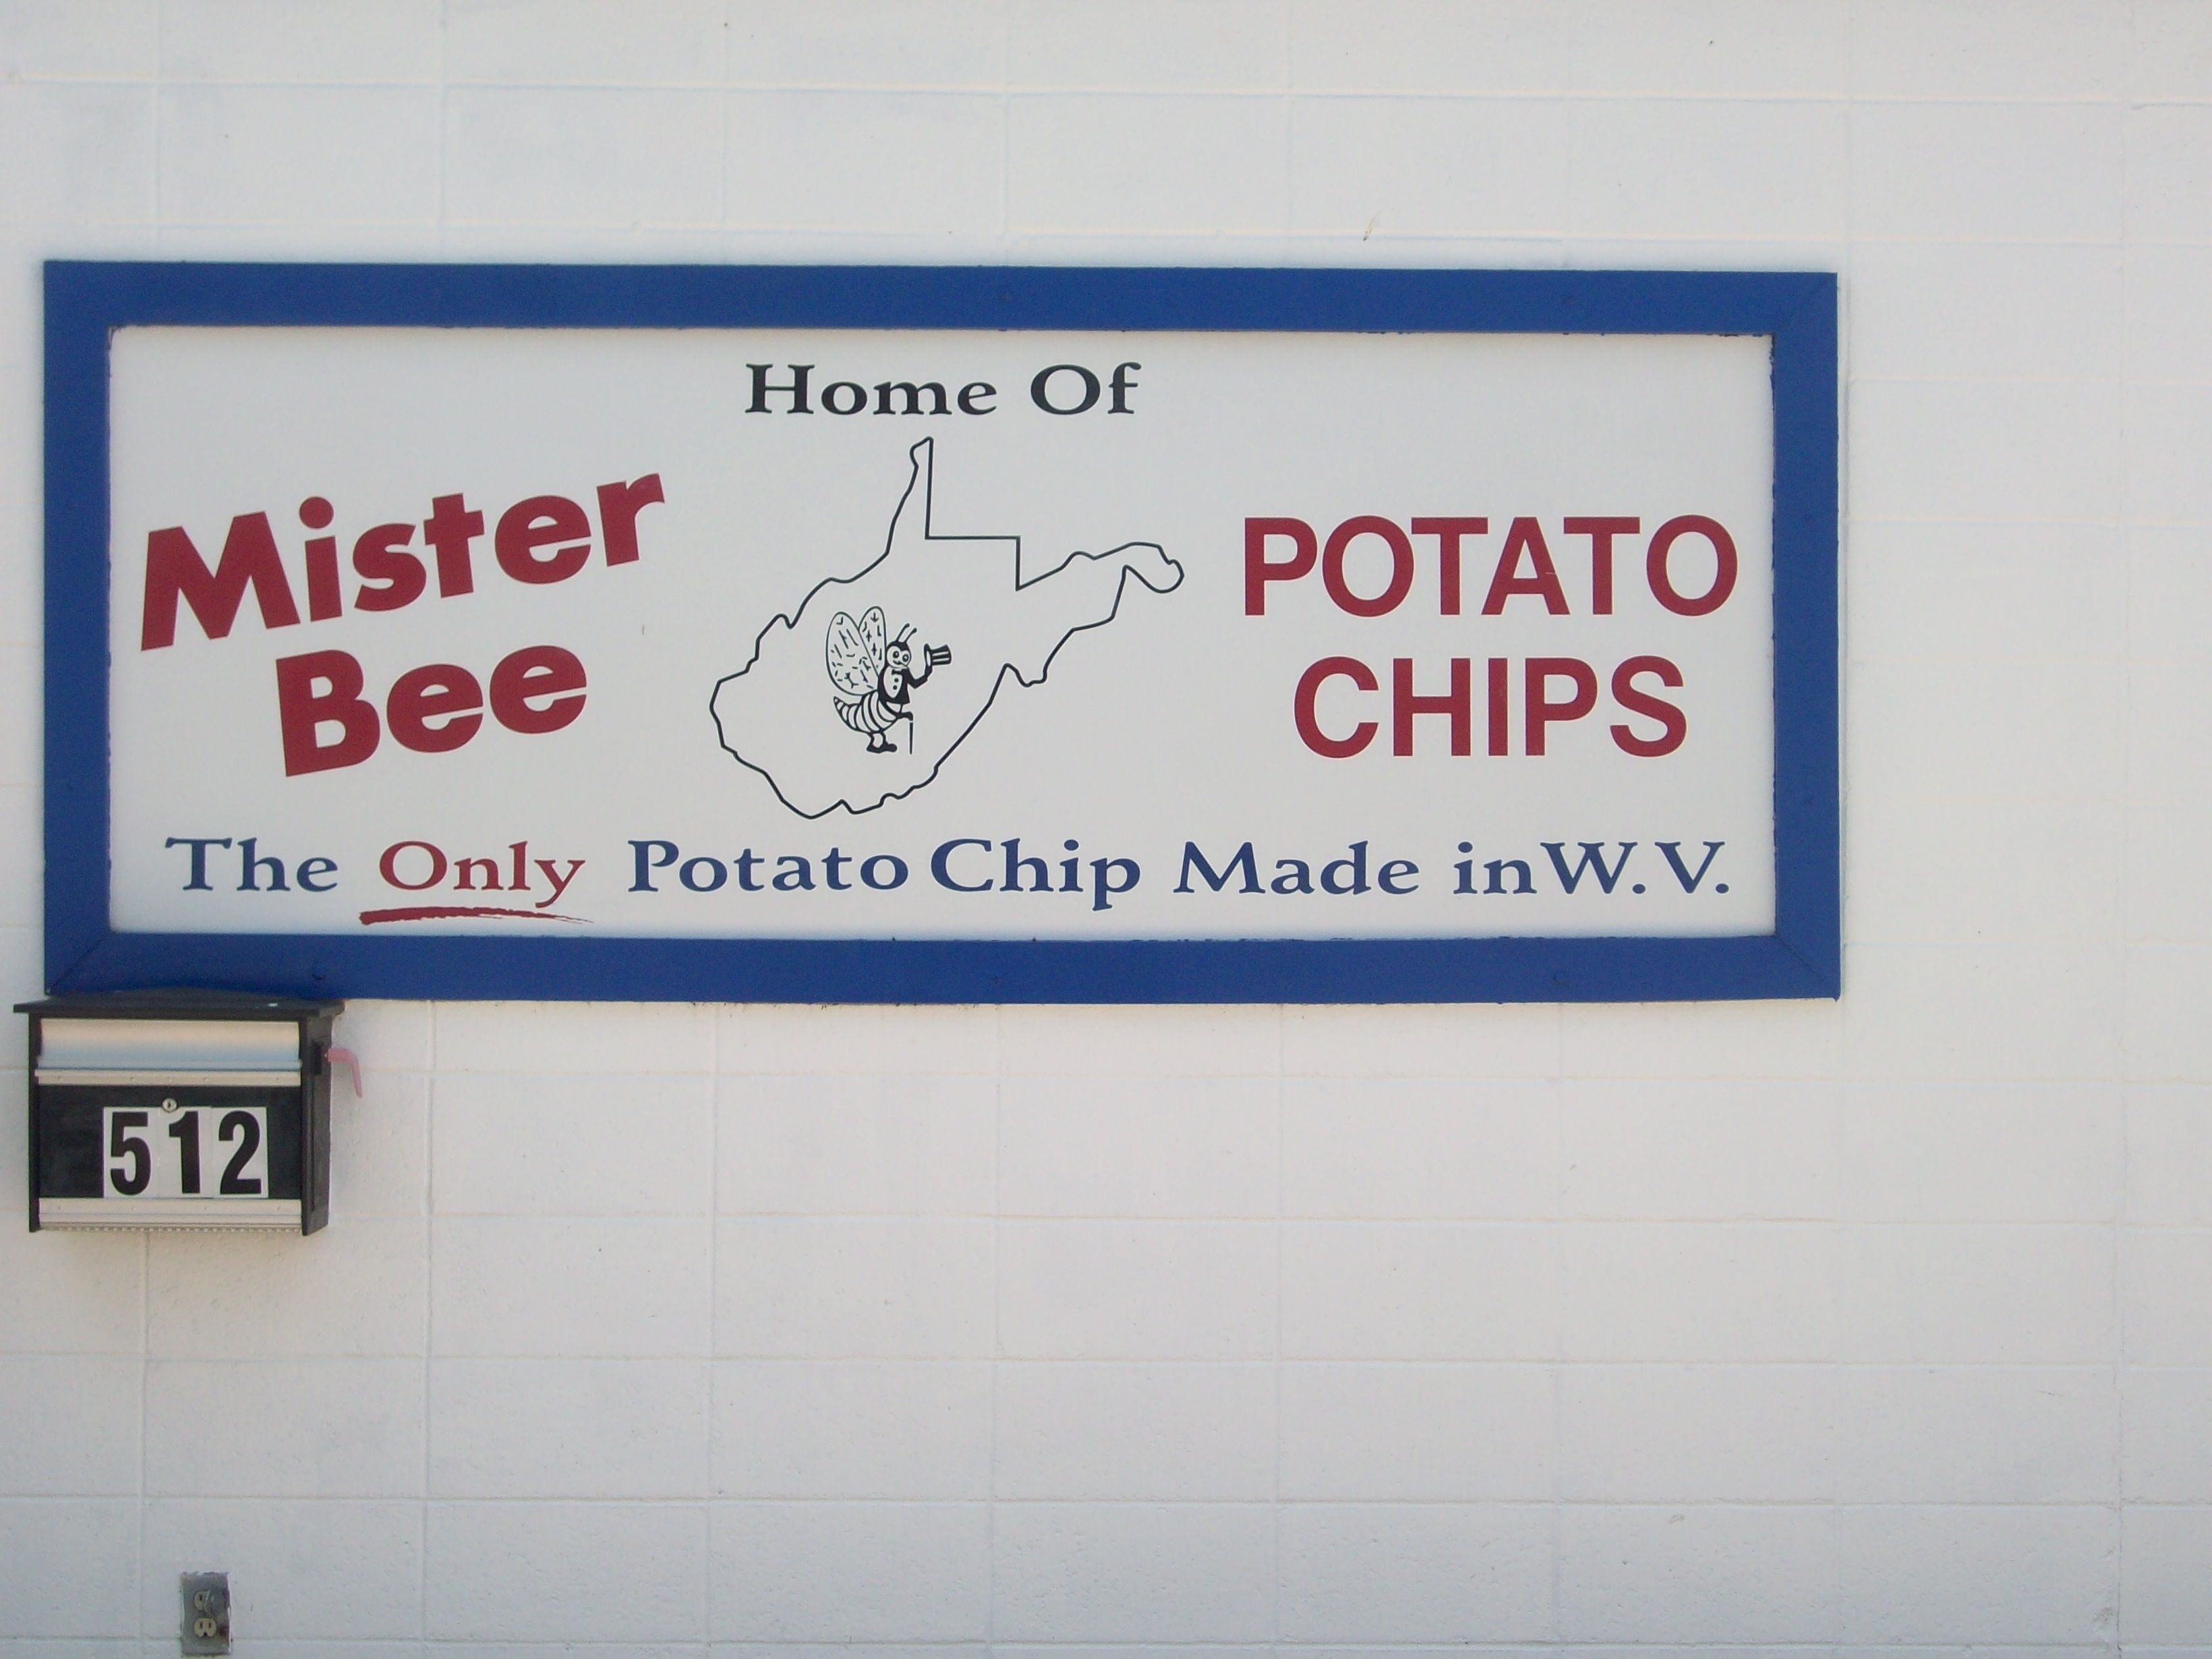 Mister Bee Potato Chip factory in Parkersburg, WV | Parkersburg ...